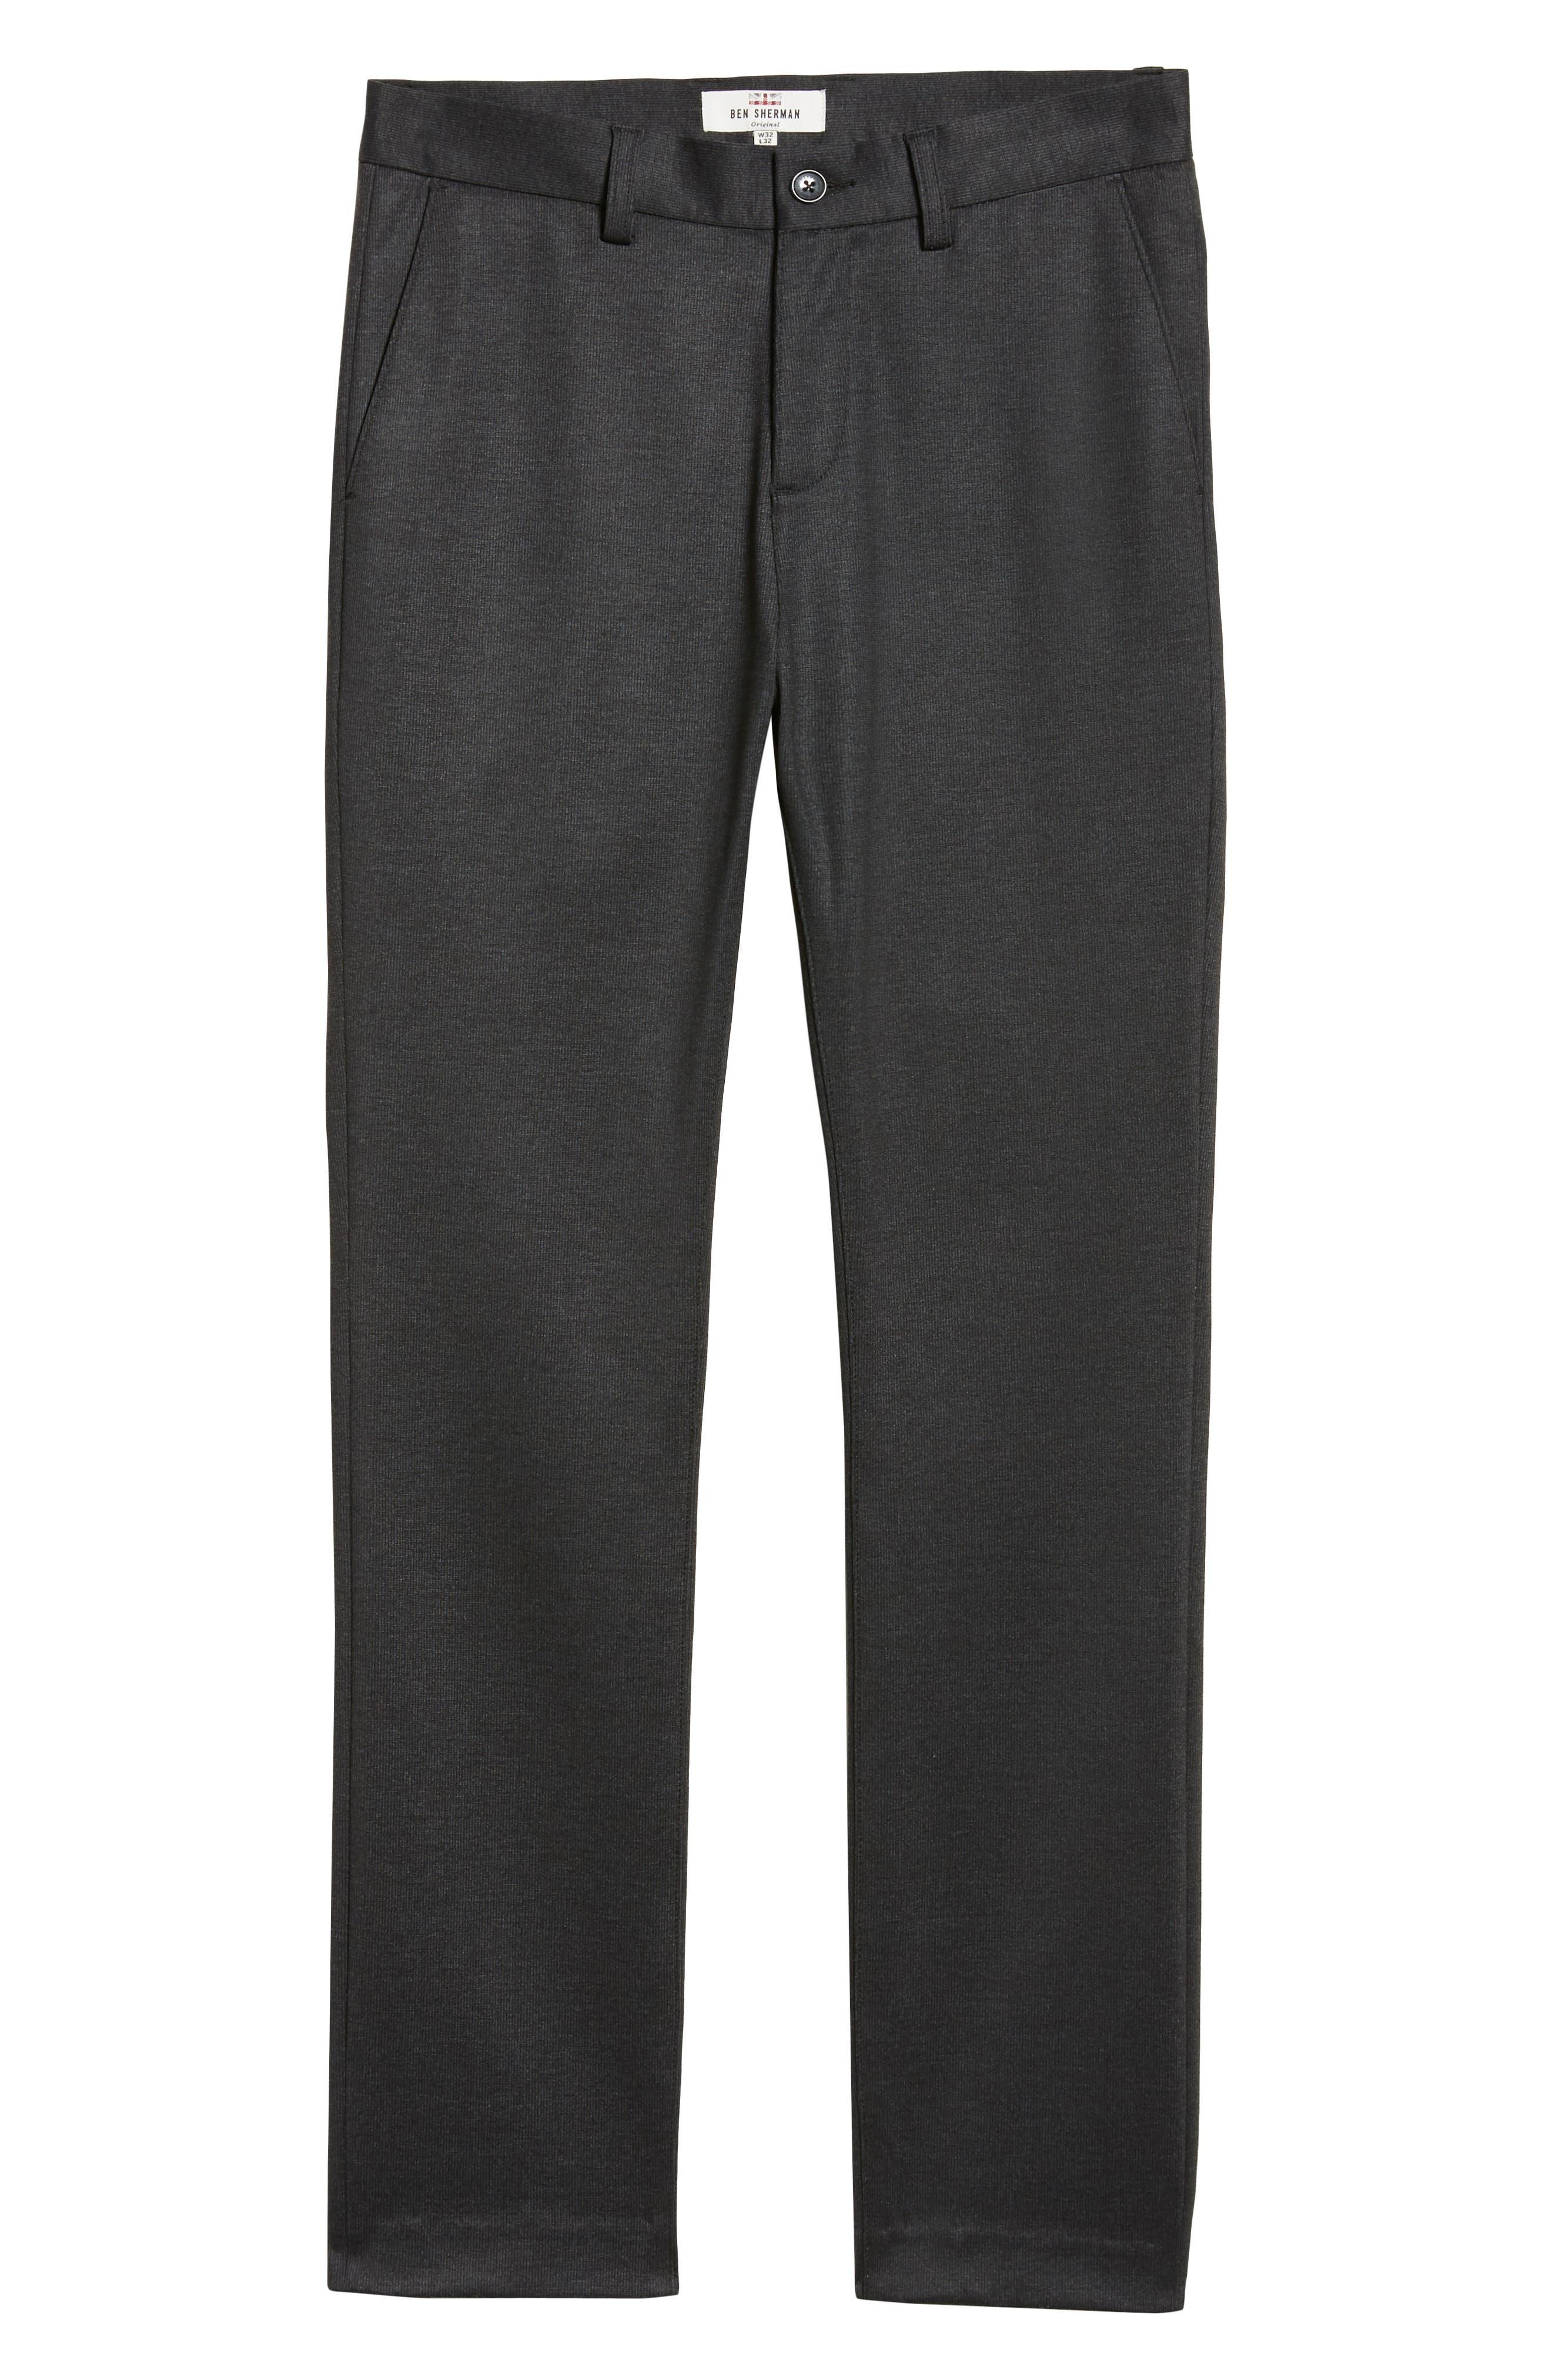 Slim Fit Ponte Knit Trousers,                             Alternate thumbnail 6, color,                             020